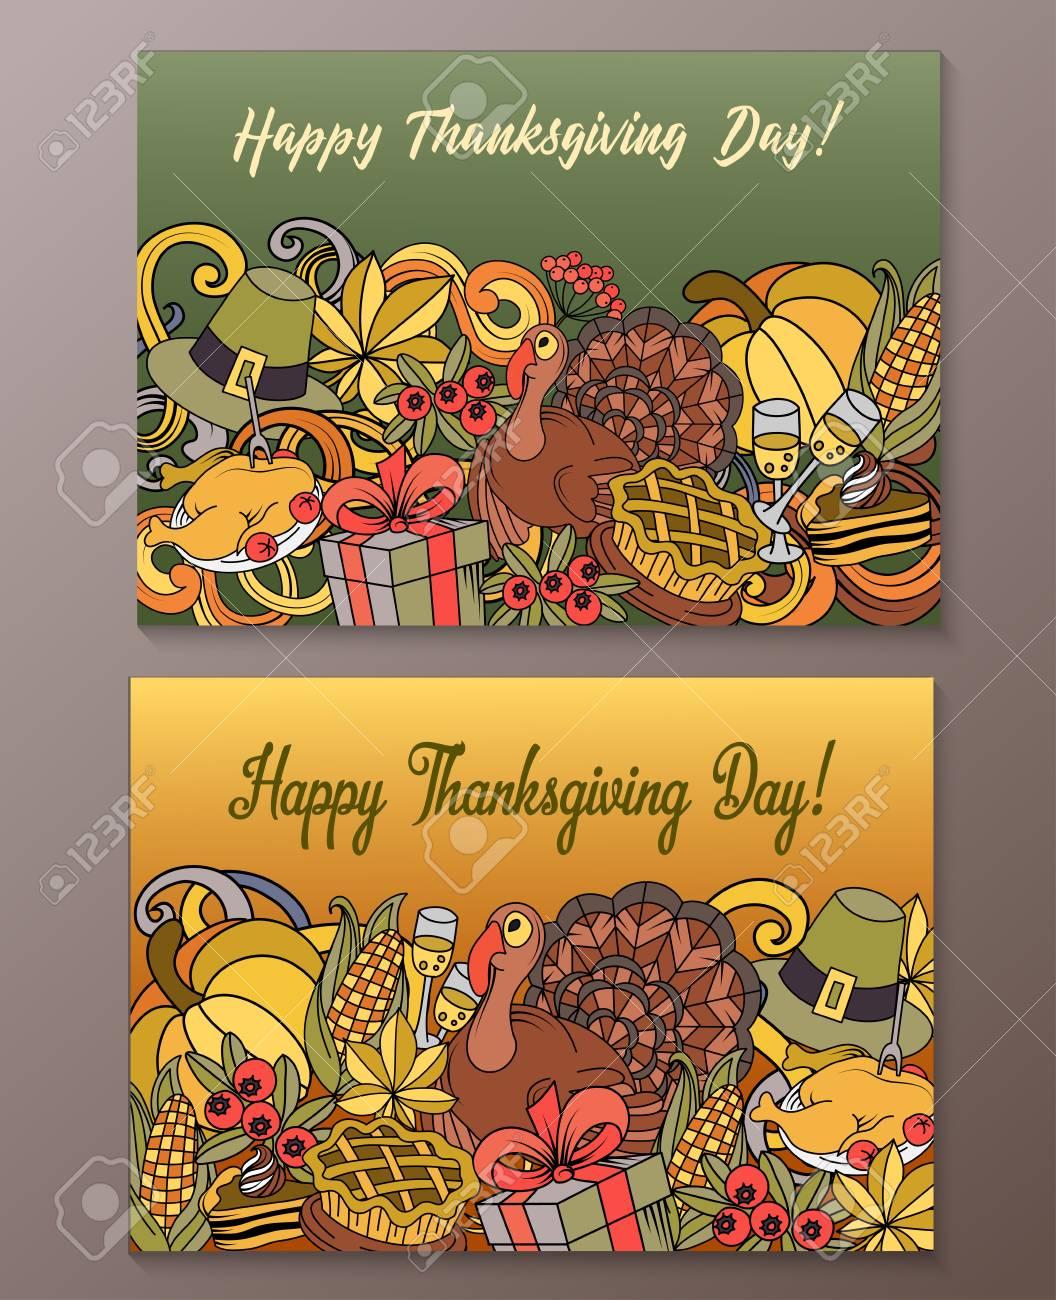 Cartoon vector hand drawn doodle happy thanksgiving day cards cartoon vector hand drawn doodle happy thanksgiving day cards horizontal banners design templates set m4hsunfo